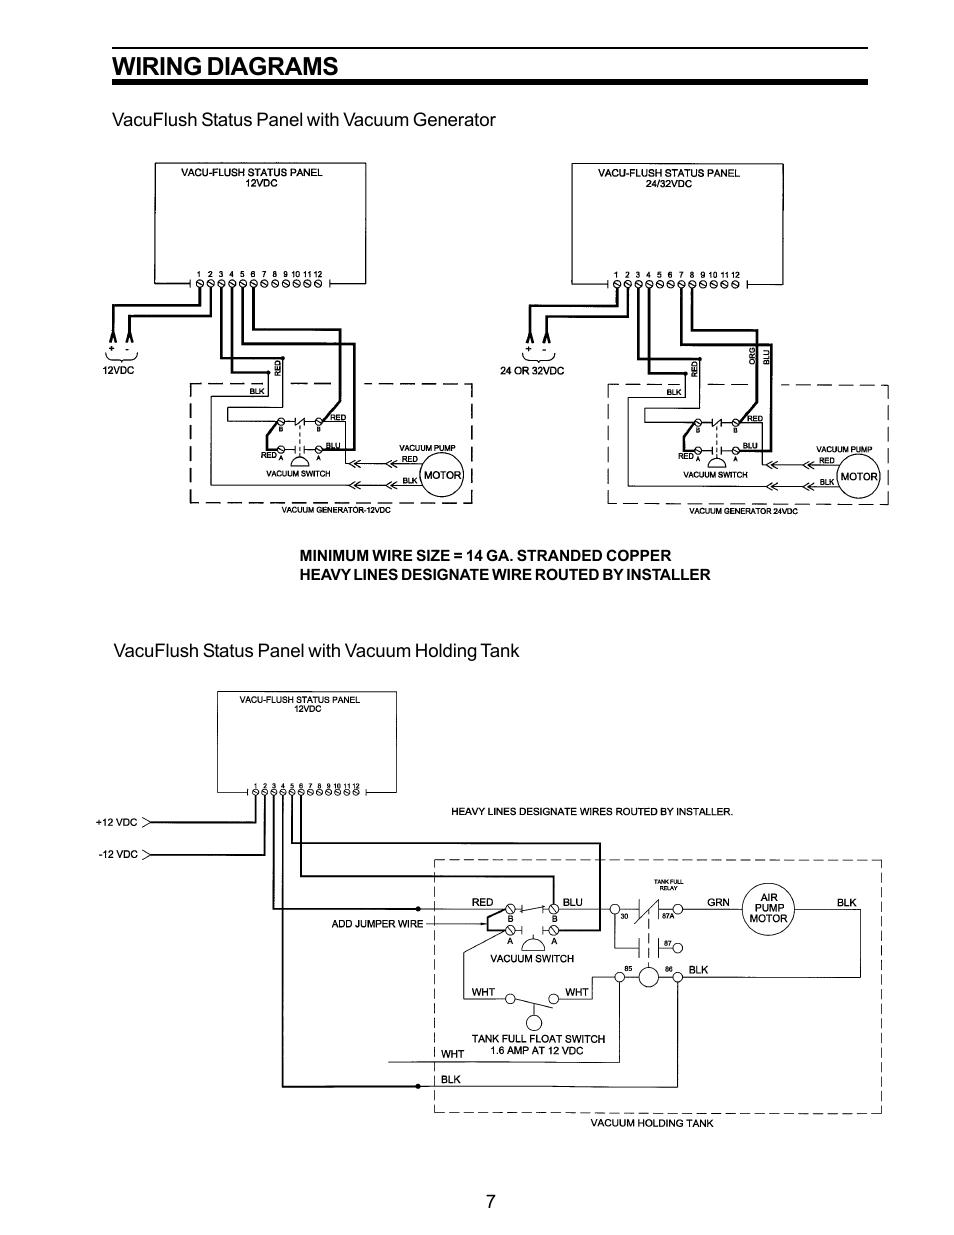 status panel with vacuum generator status panel with vacuum holding tank wiring diagrams